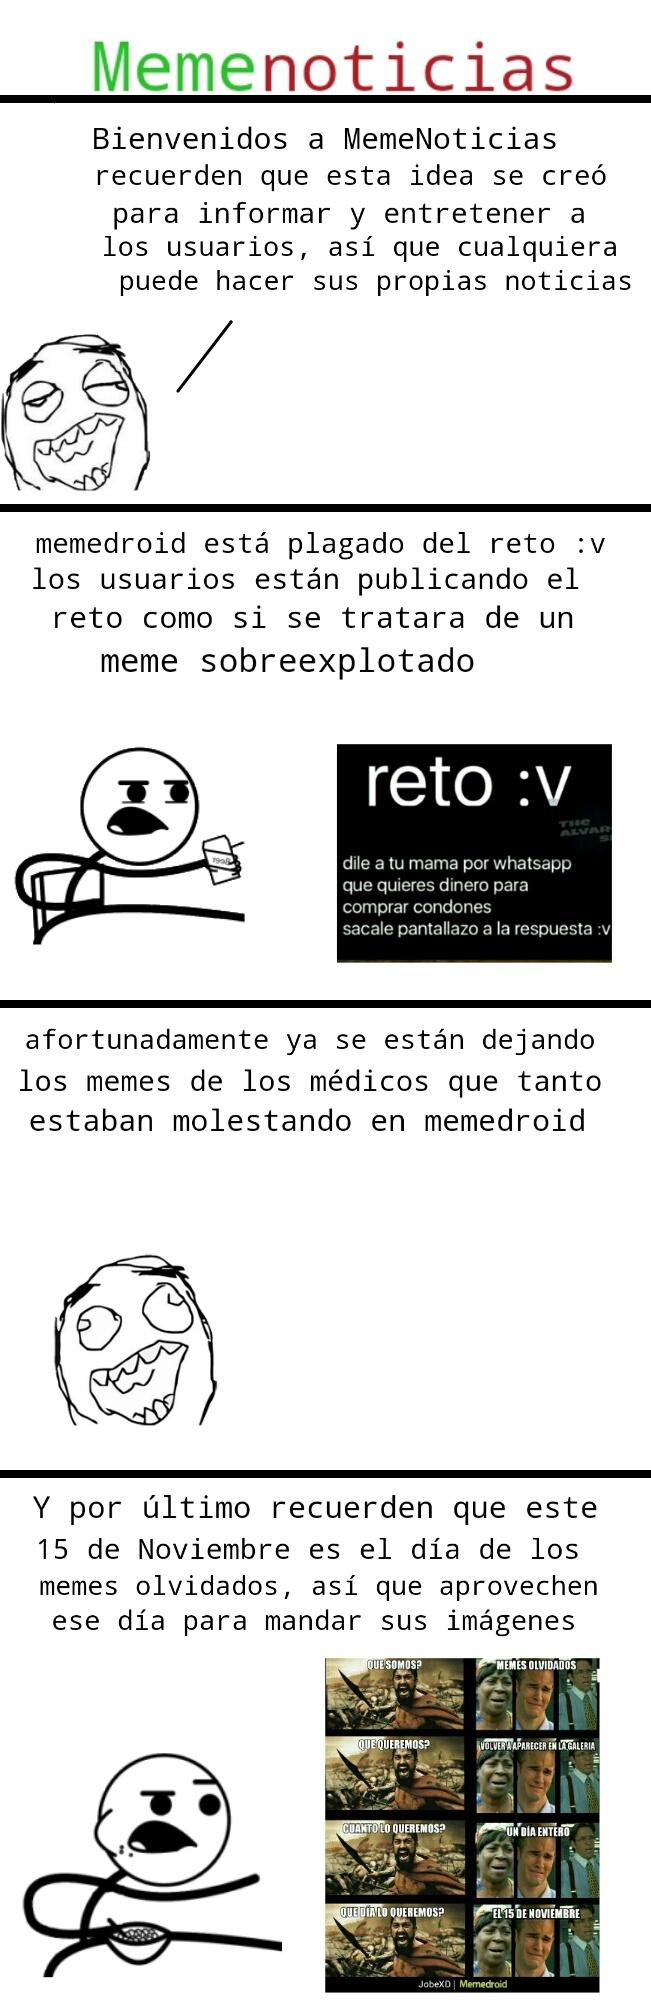 Memenoticias